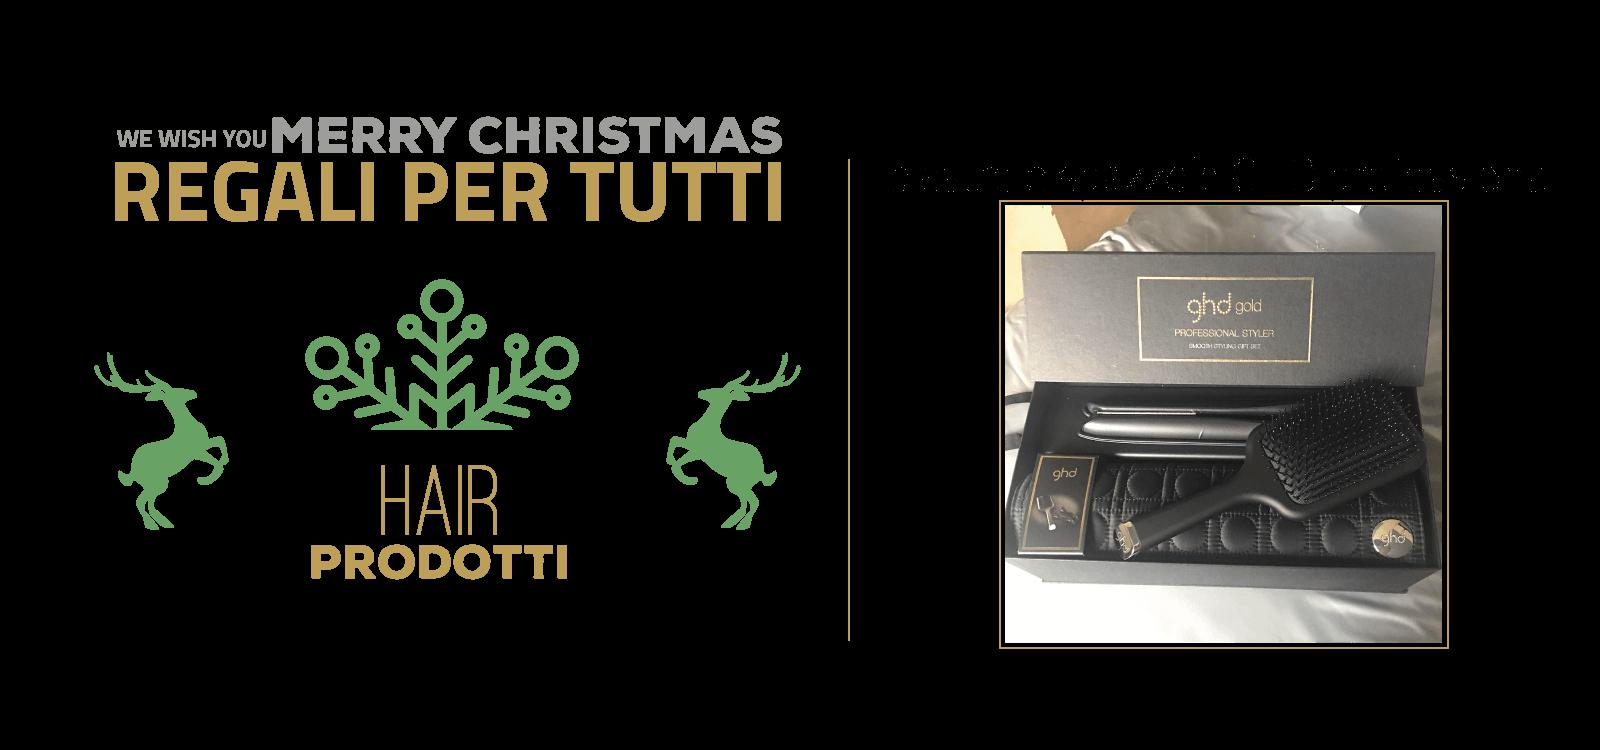 4_slide-show-regali-Natale-2018